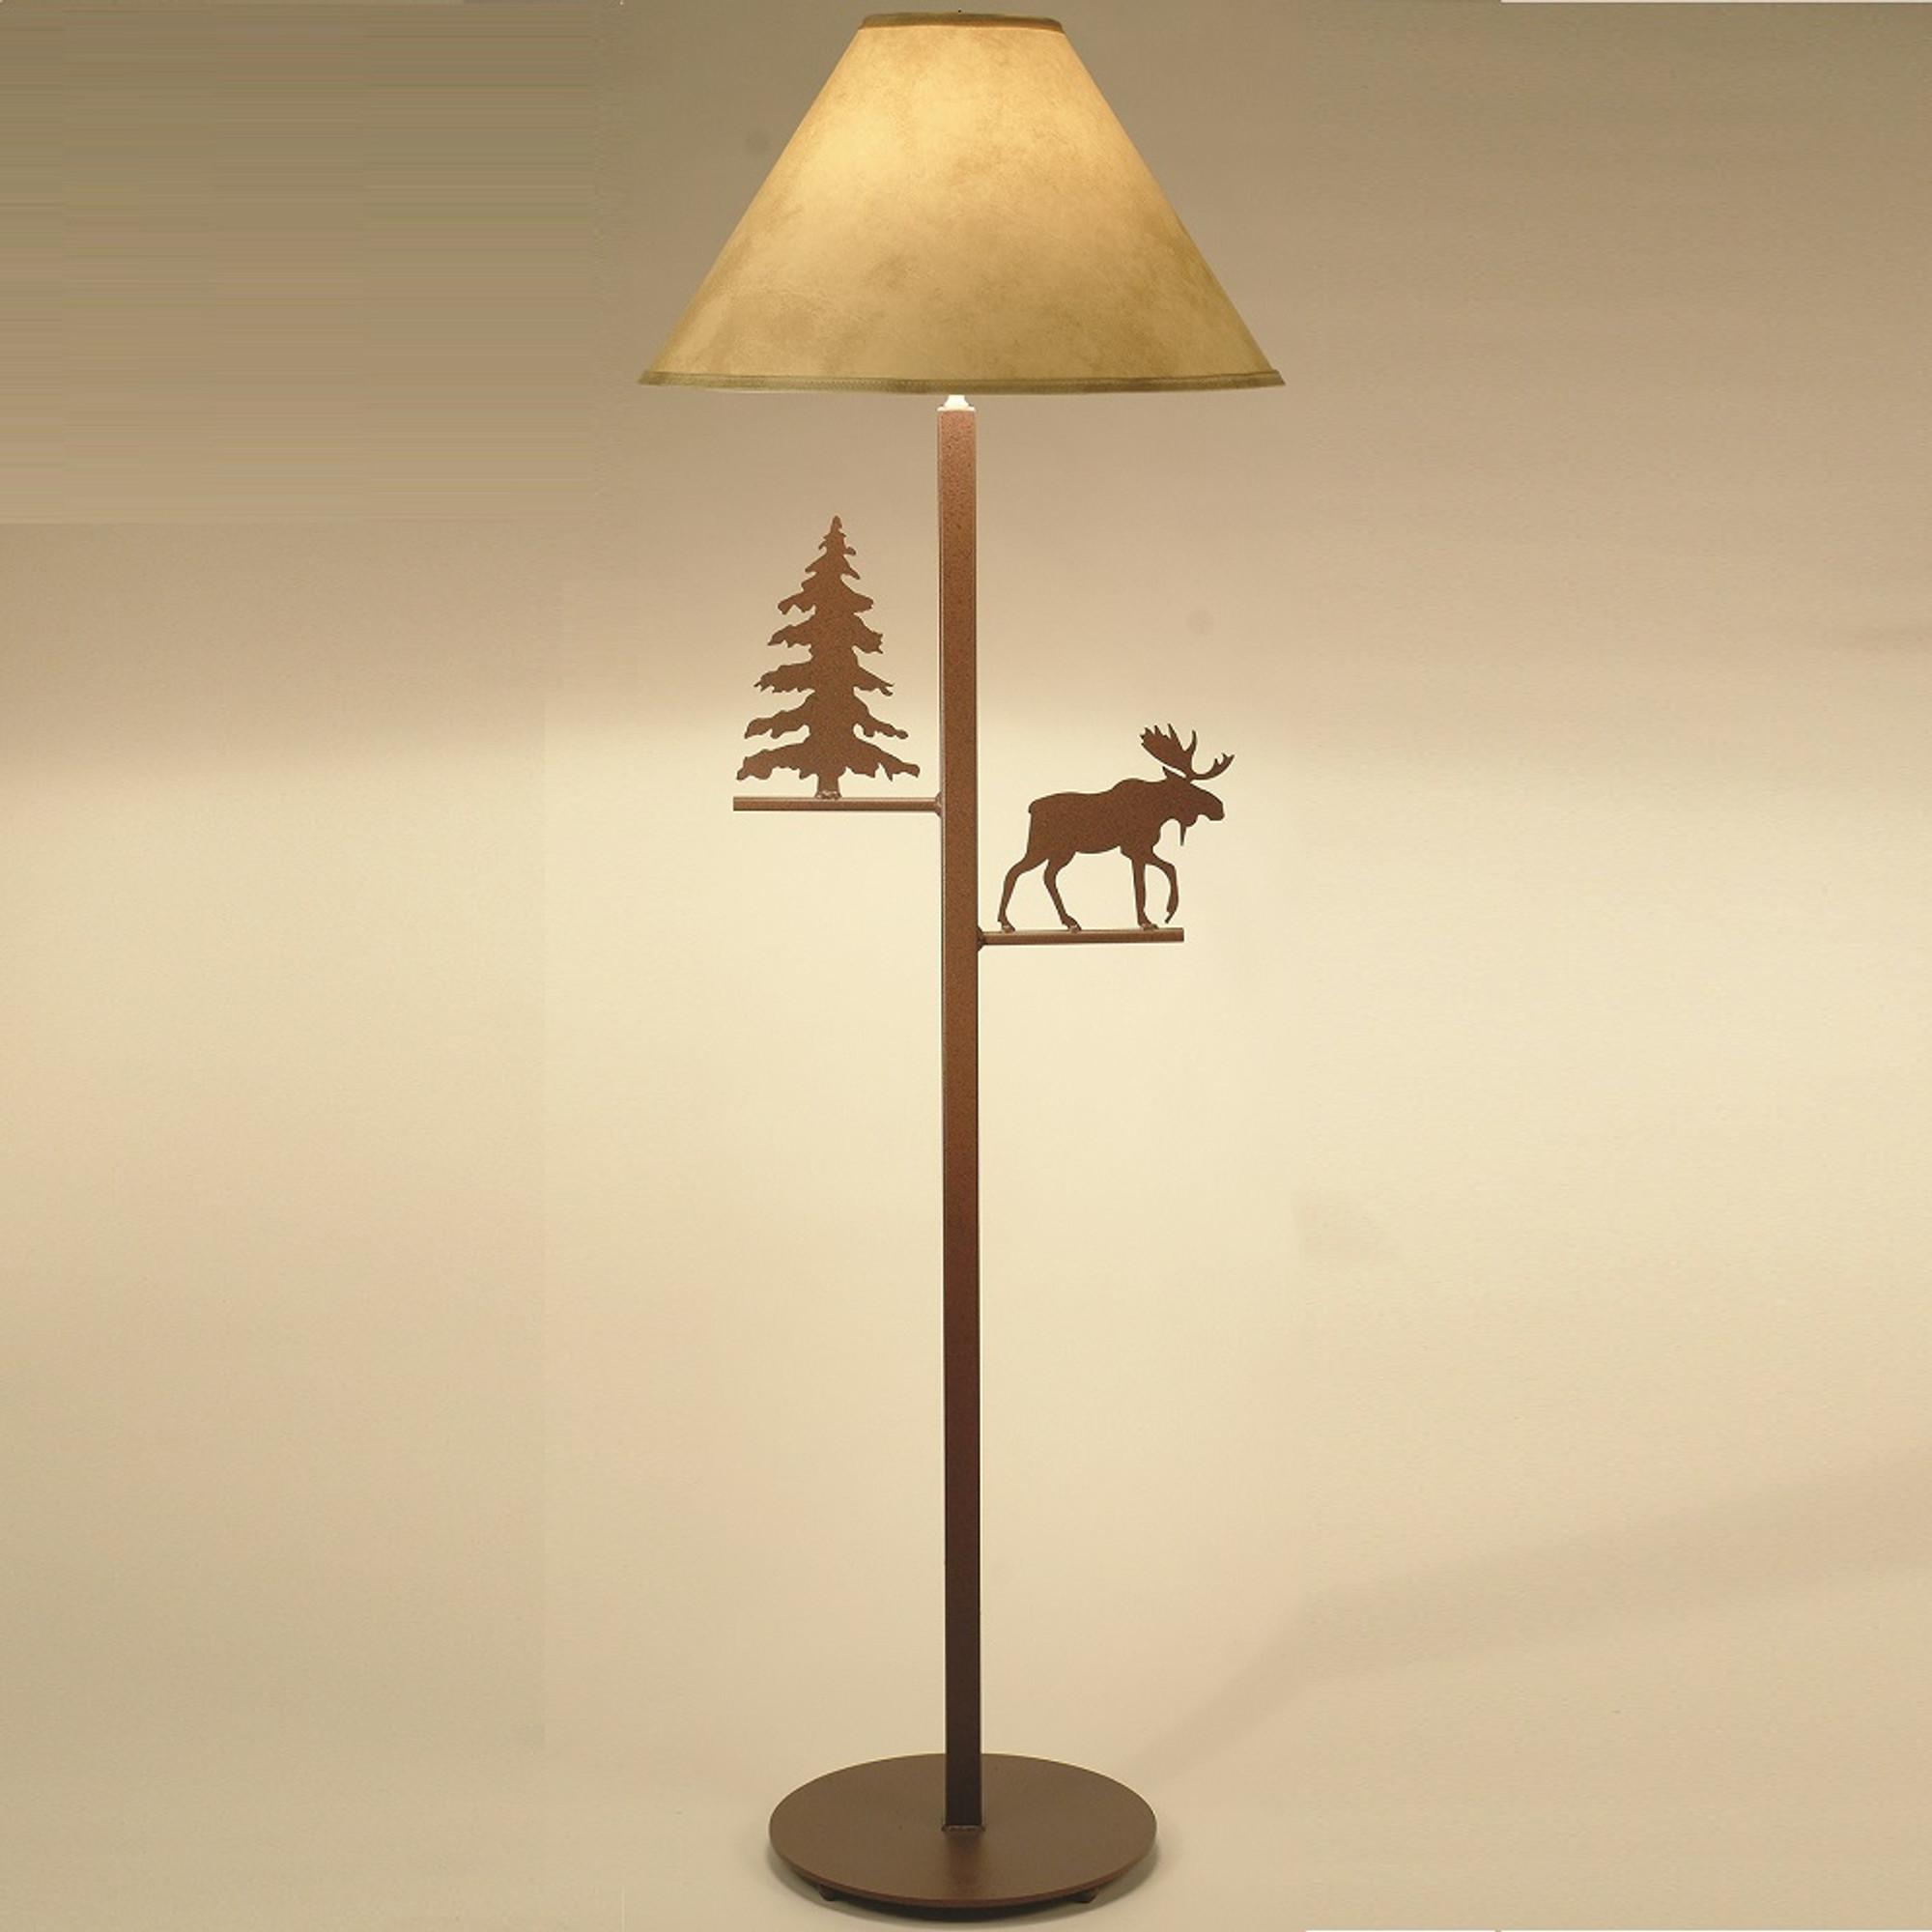 Moose floor lamp pine tree lighting decor furnishing moose pine tree floor lamp colorado dallas cdfl1013sh2158 aloadofball Choice Image